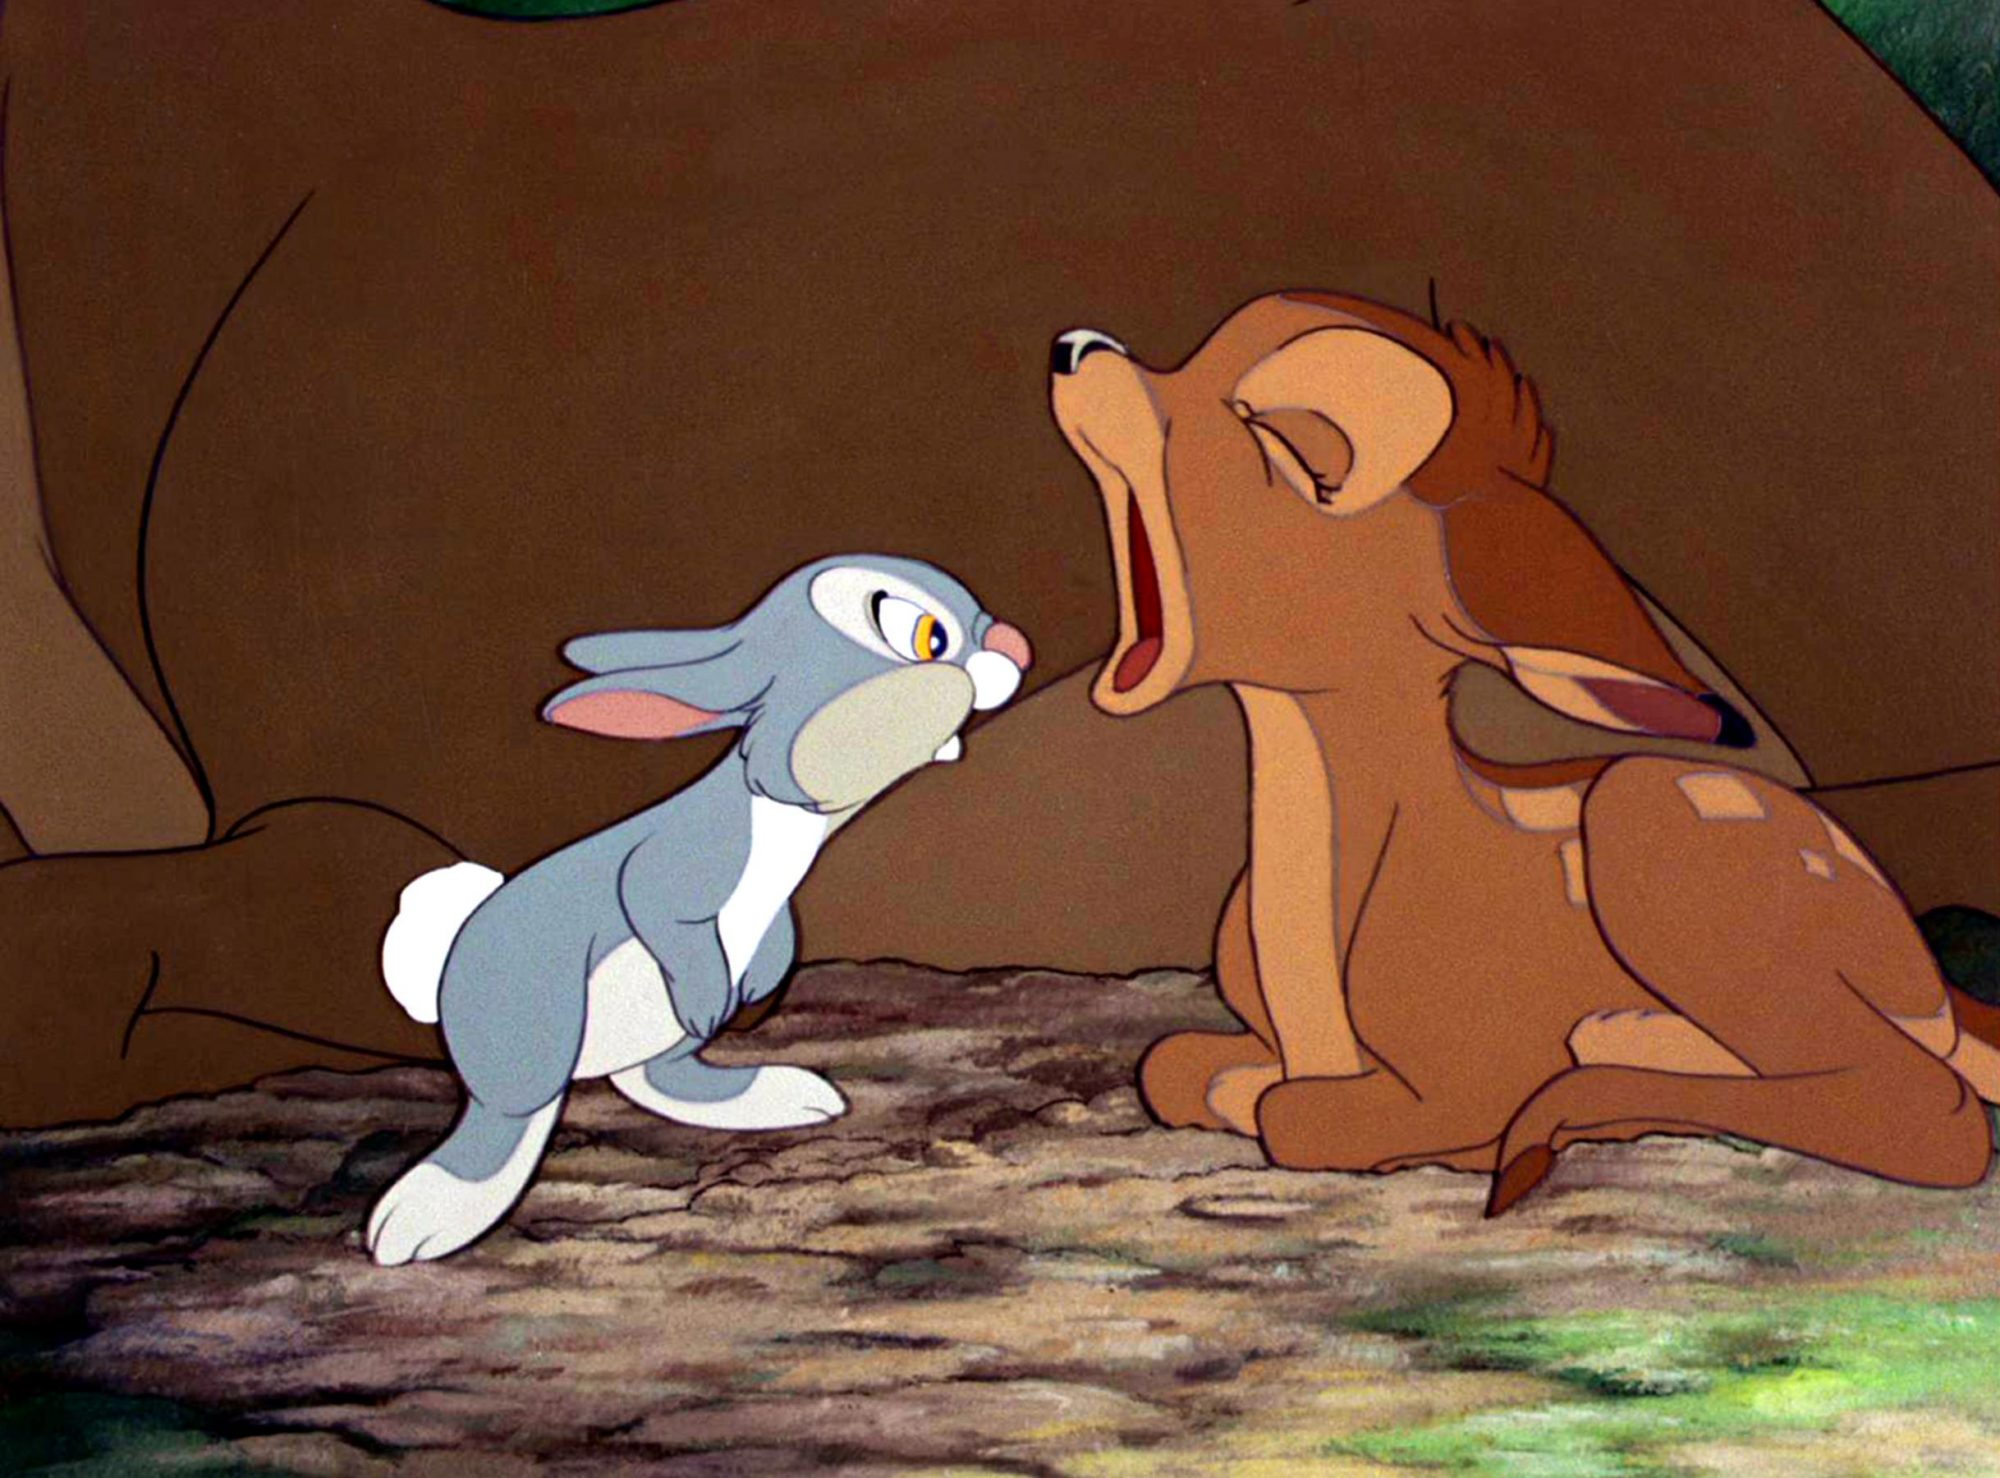 BAMBI, Thumber, Bambi, 1942